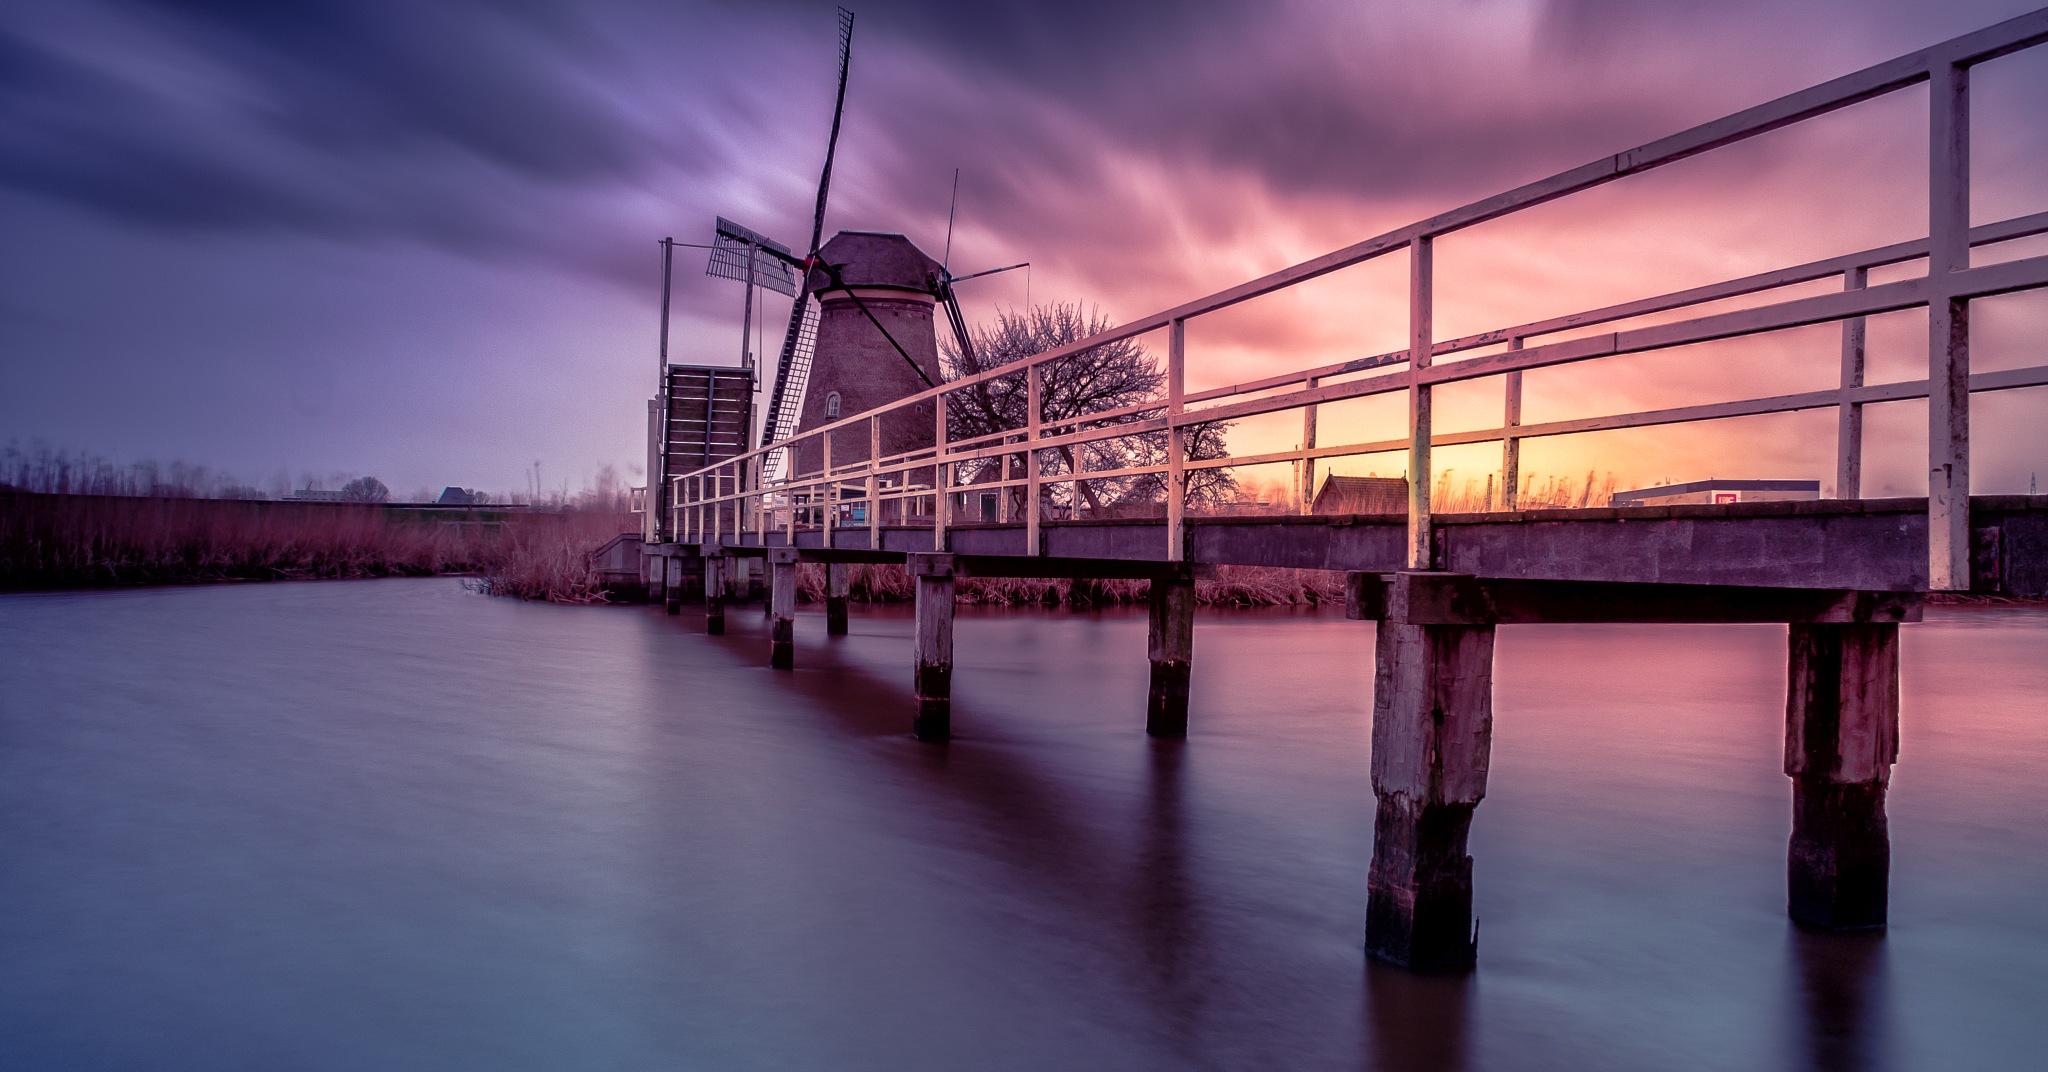 Dutch windmill in the storm by Stef van Winssen